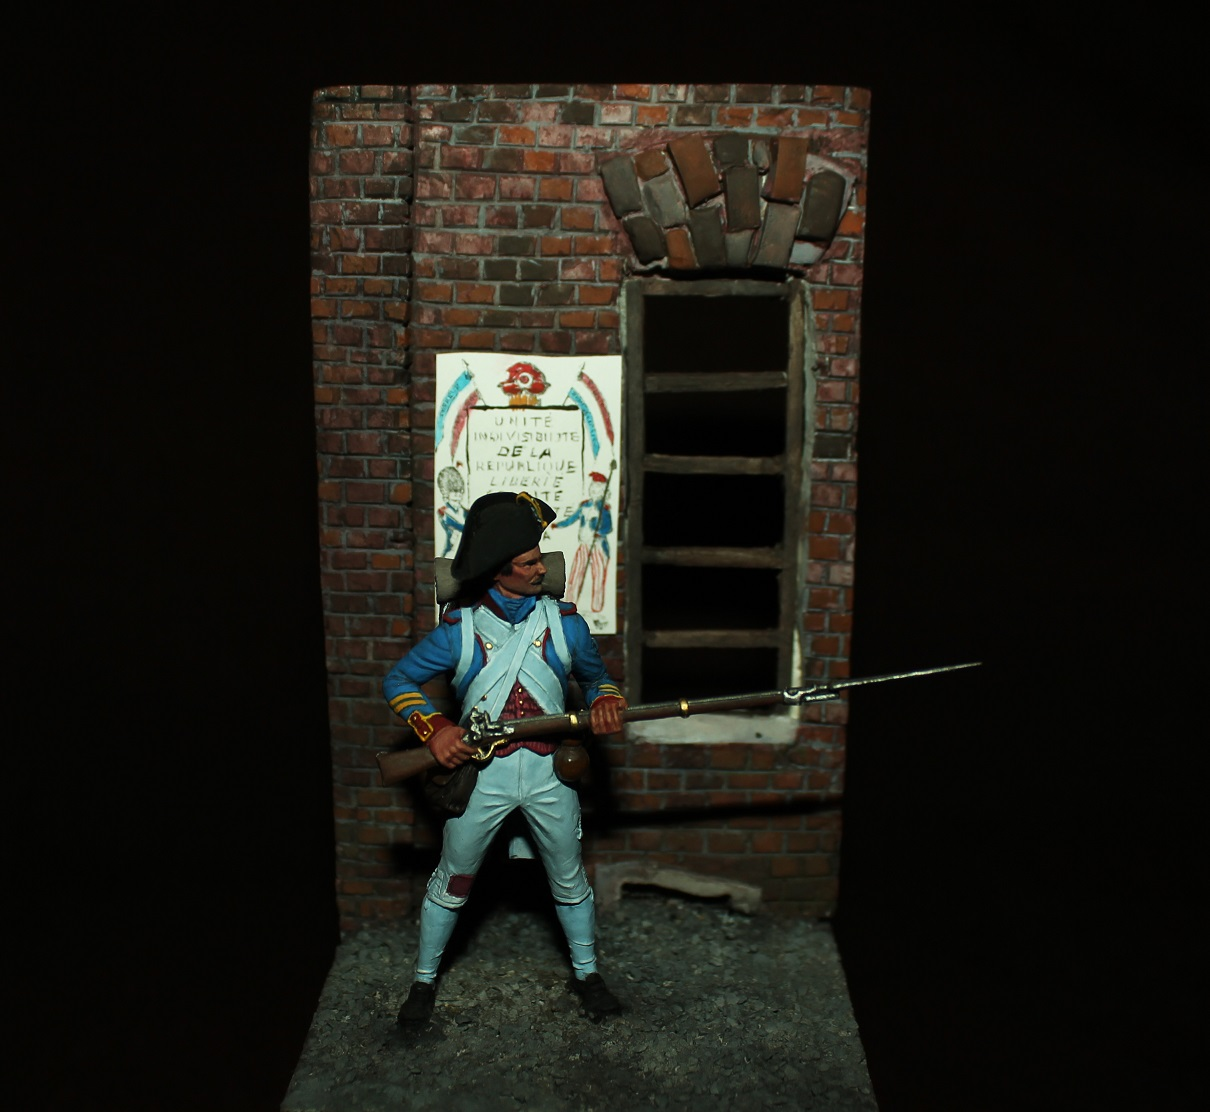 Figures: Defending the Revolution, photo #2